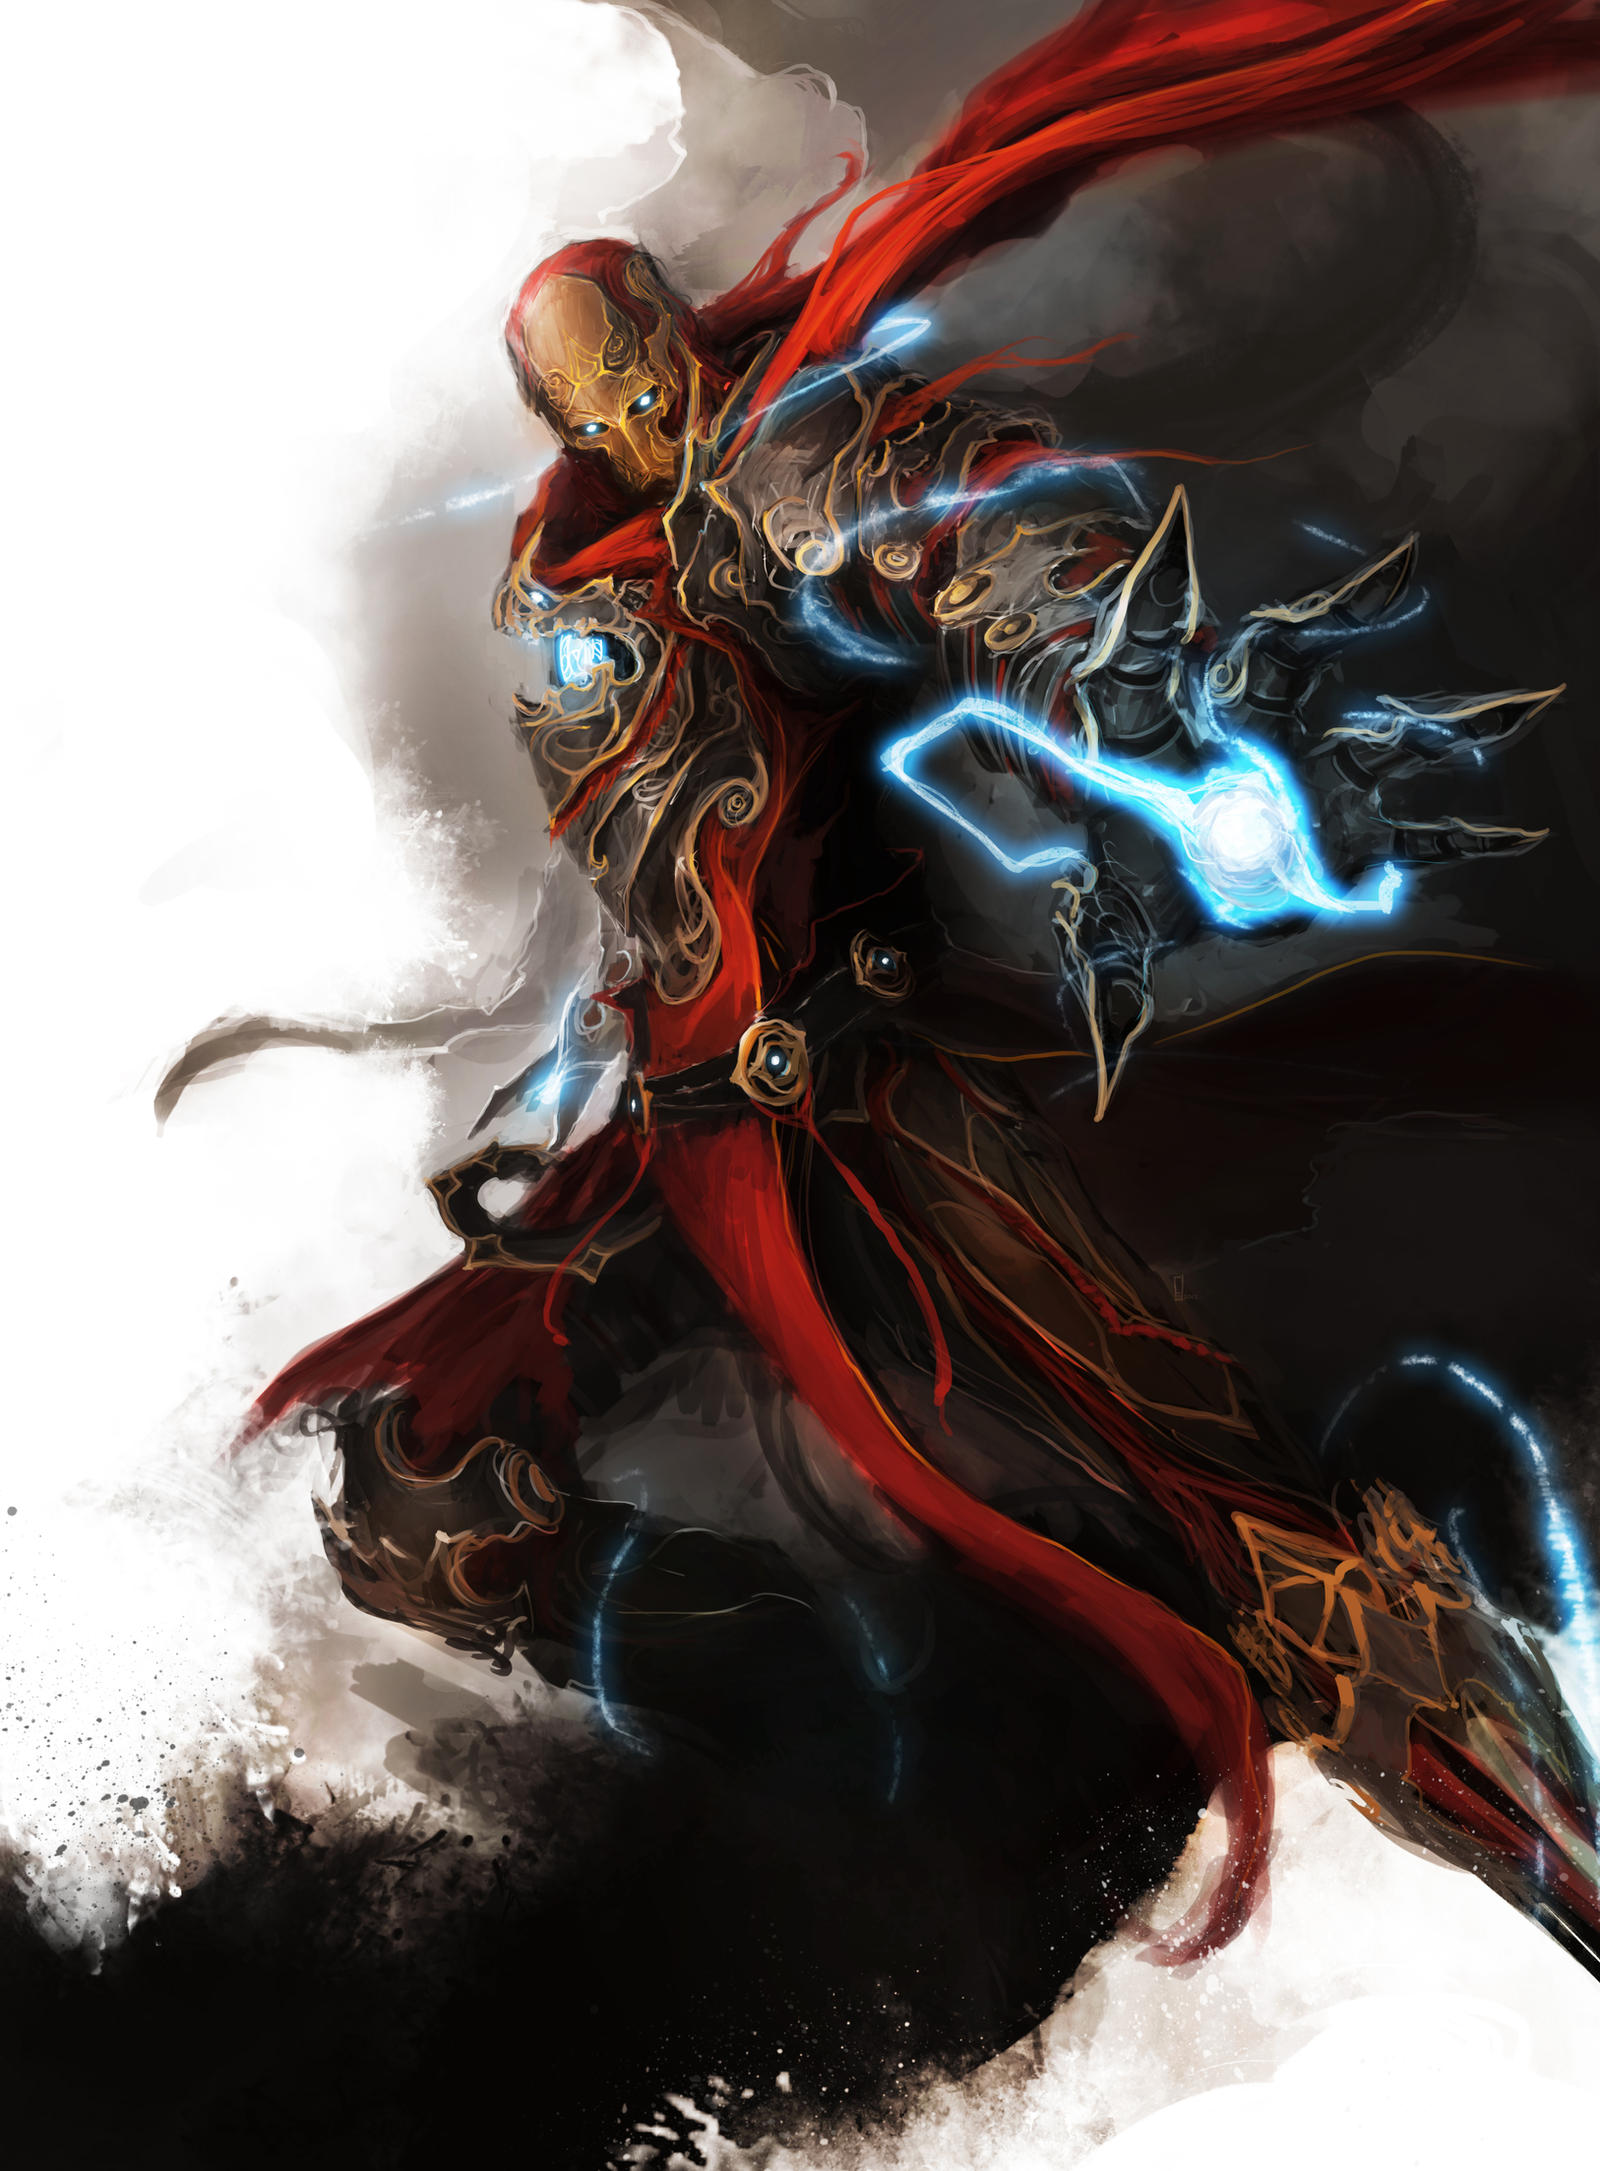 Képek - Page 3 The_avengers___iron_man_by_thedurrrrian-d55tn2d